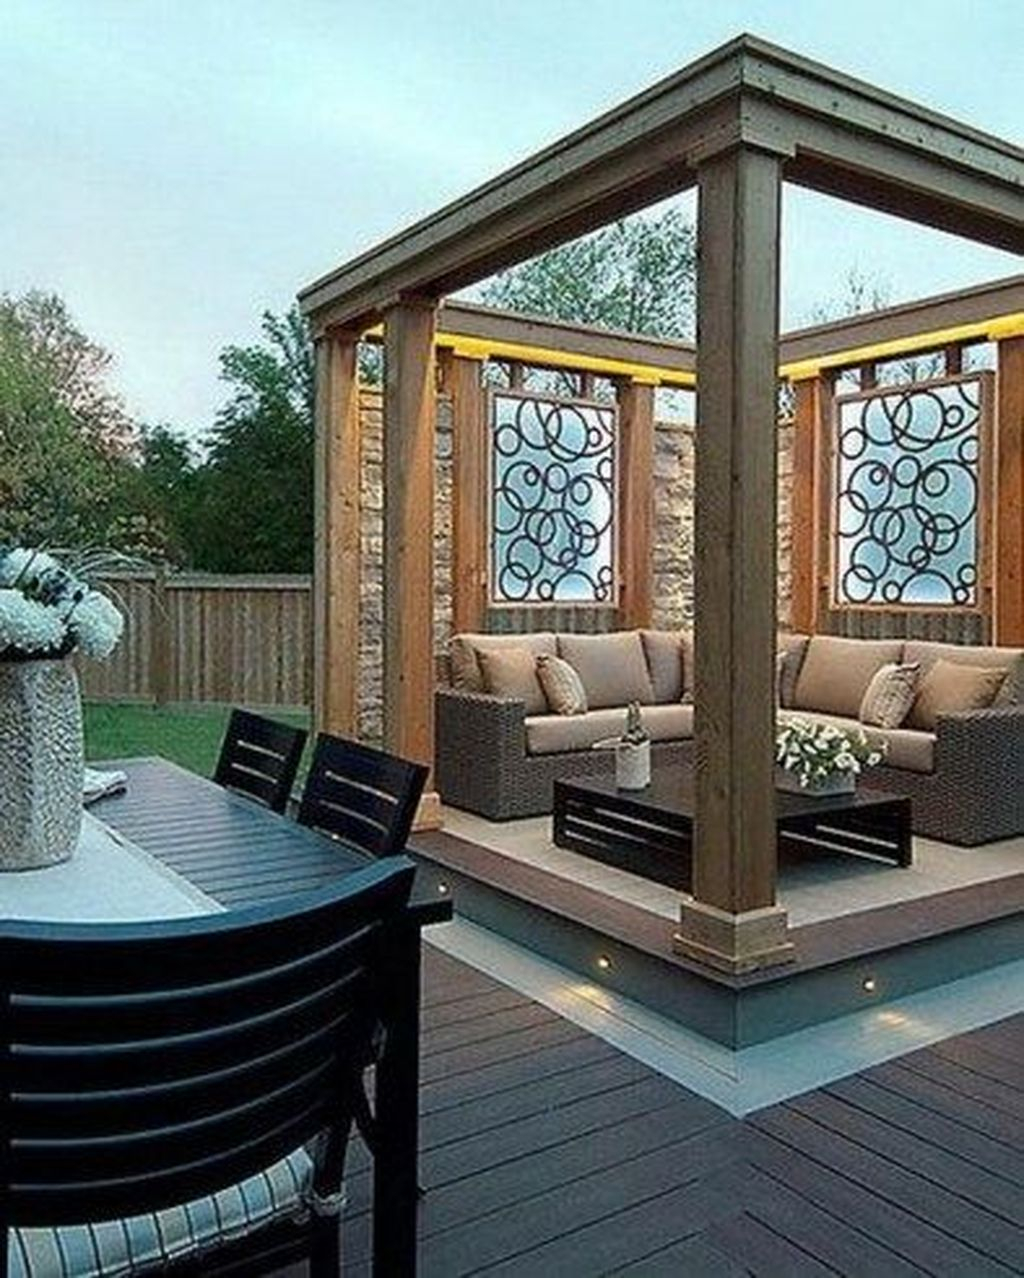 Inspiring Minimalist Frontyard Design Ideas To Try Asap 28